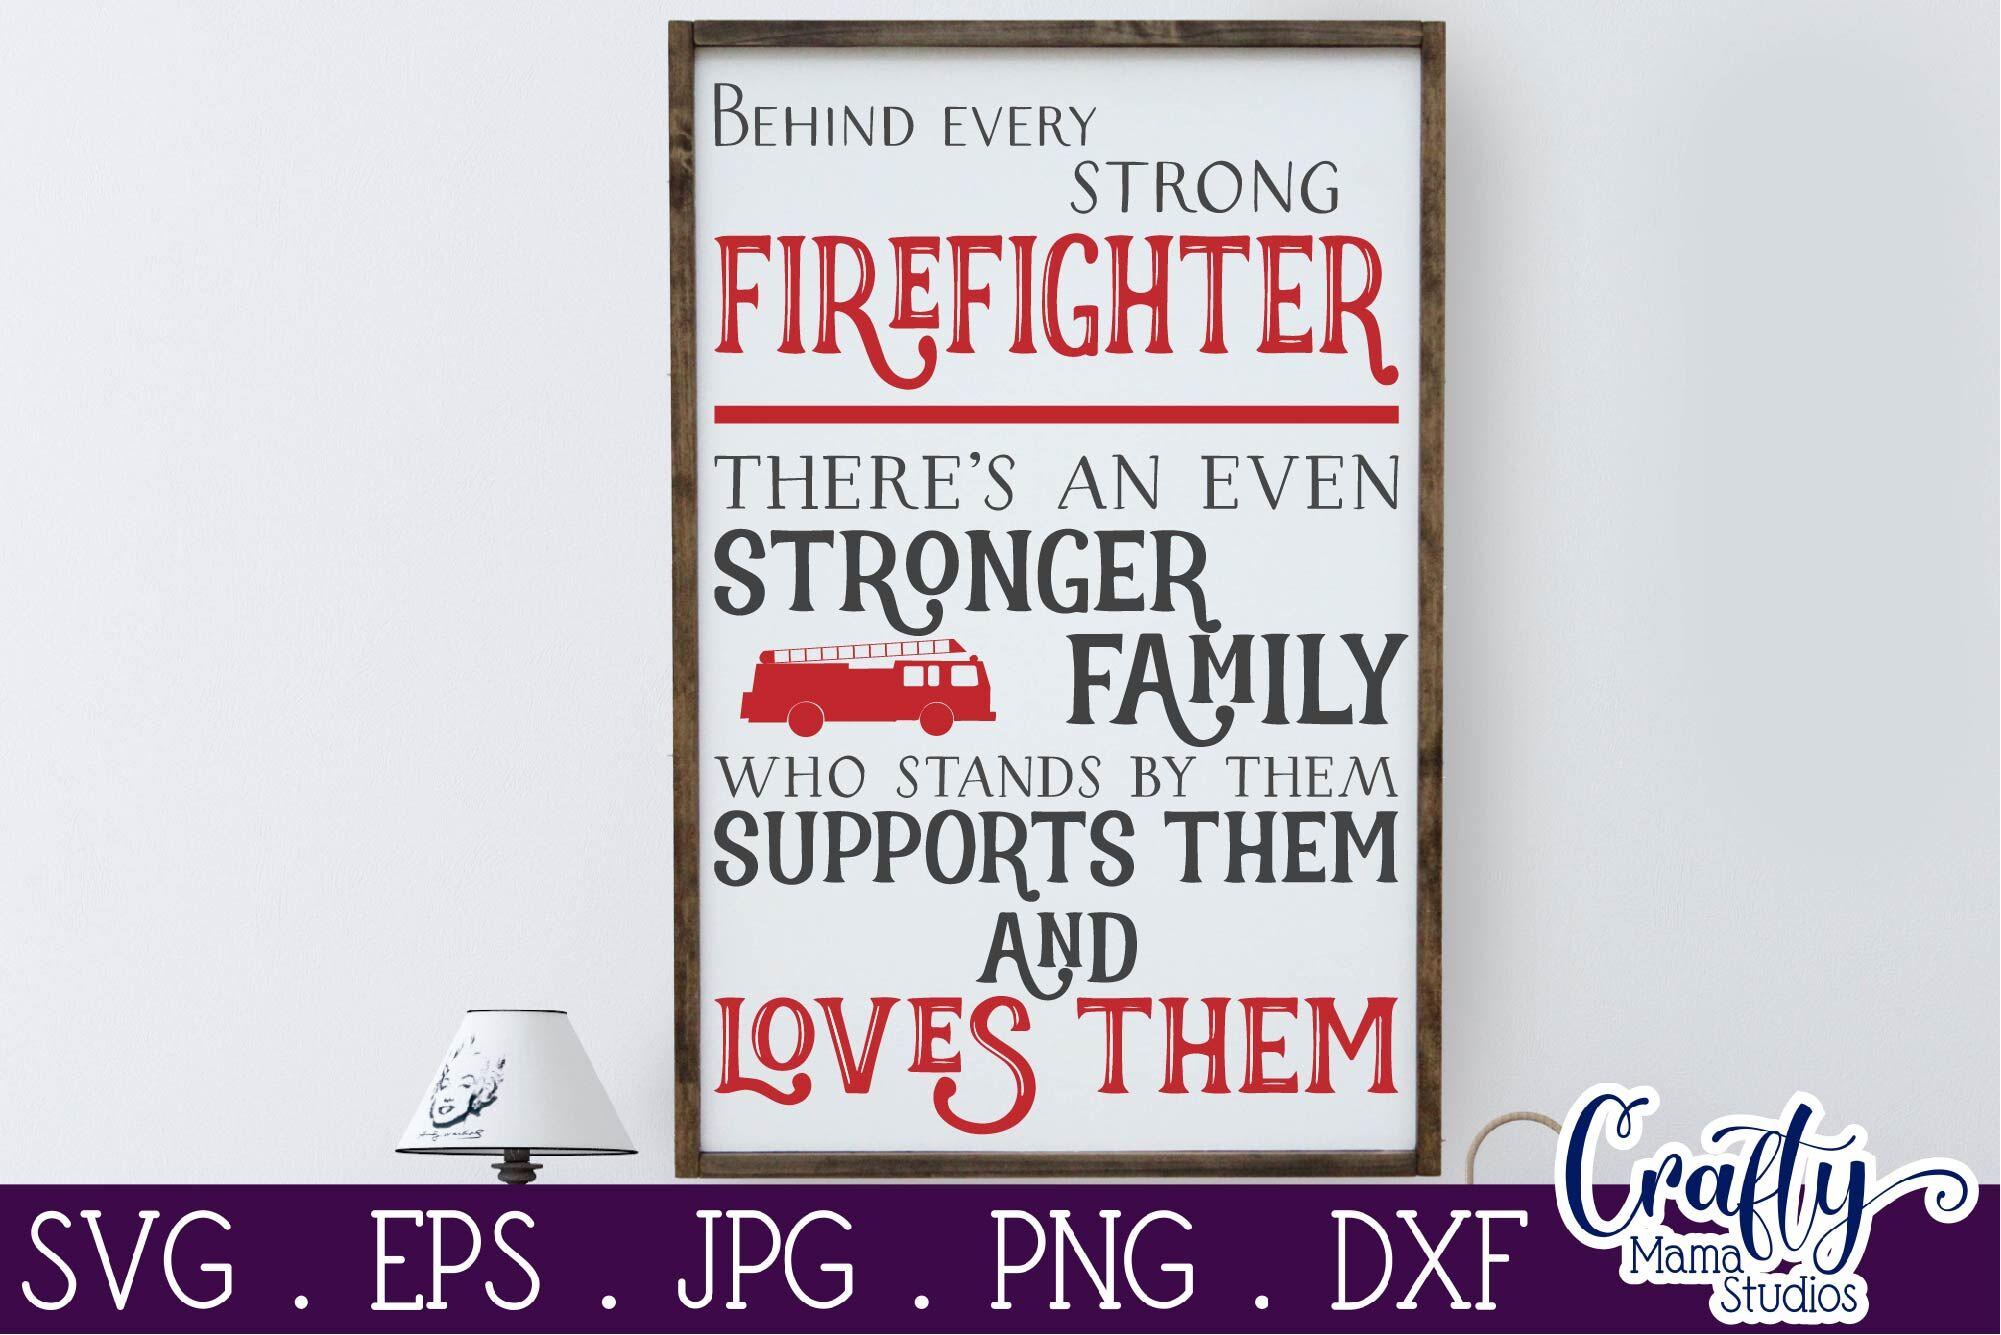 Firefighter Svg House Rules Svg Firefighter Decor Home Svg By Crafty Mama Studios Thehungryjpeg Com